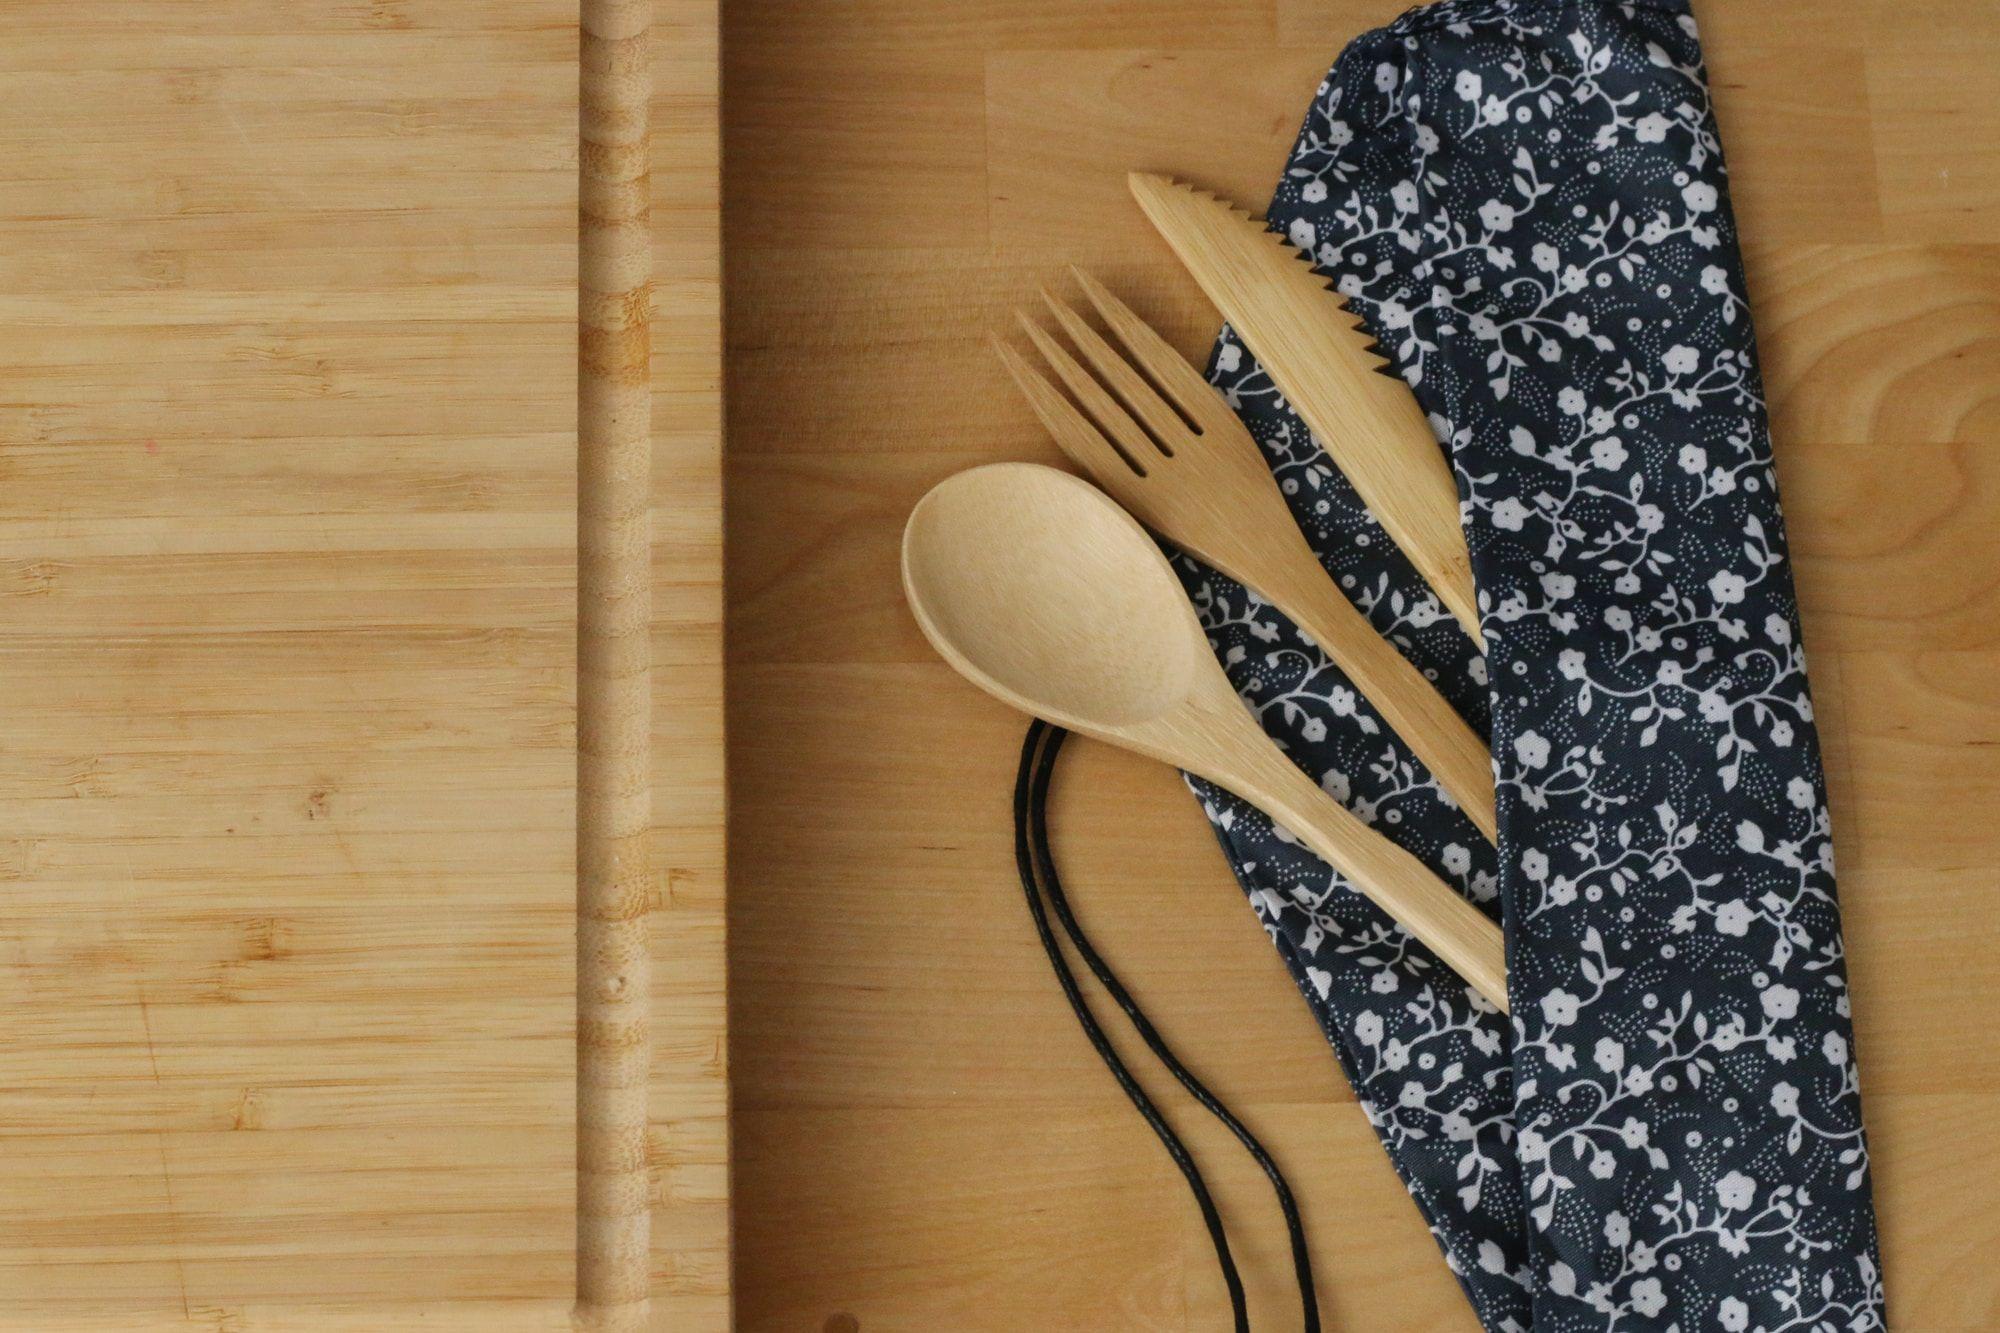 A bamboo cutlery set